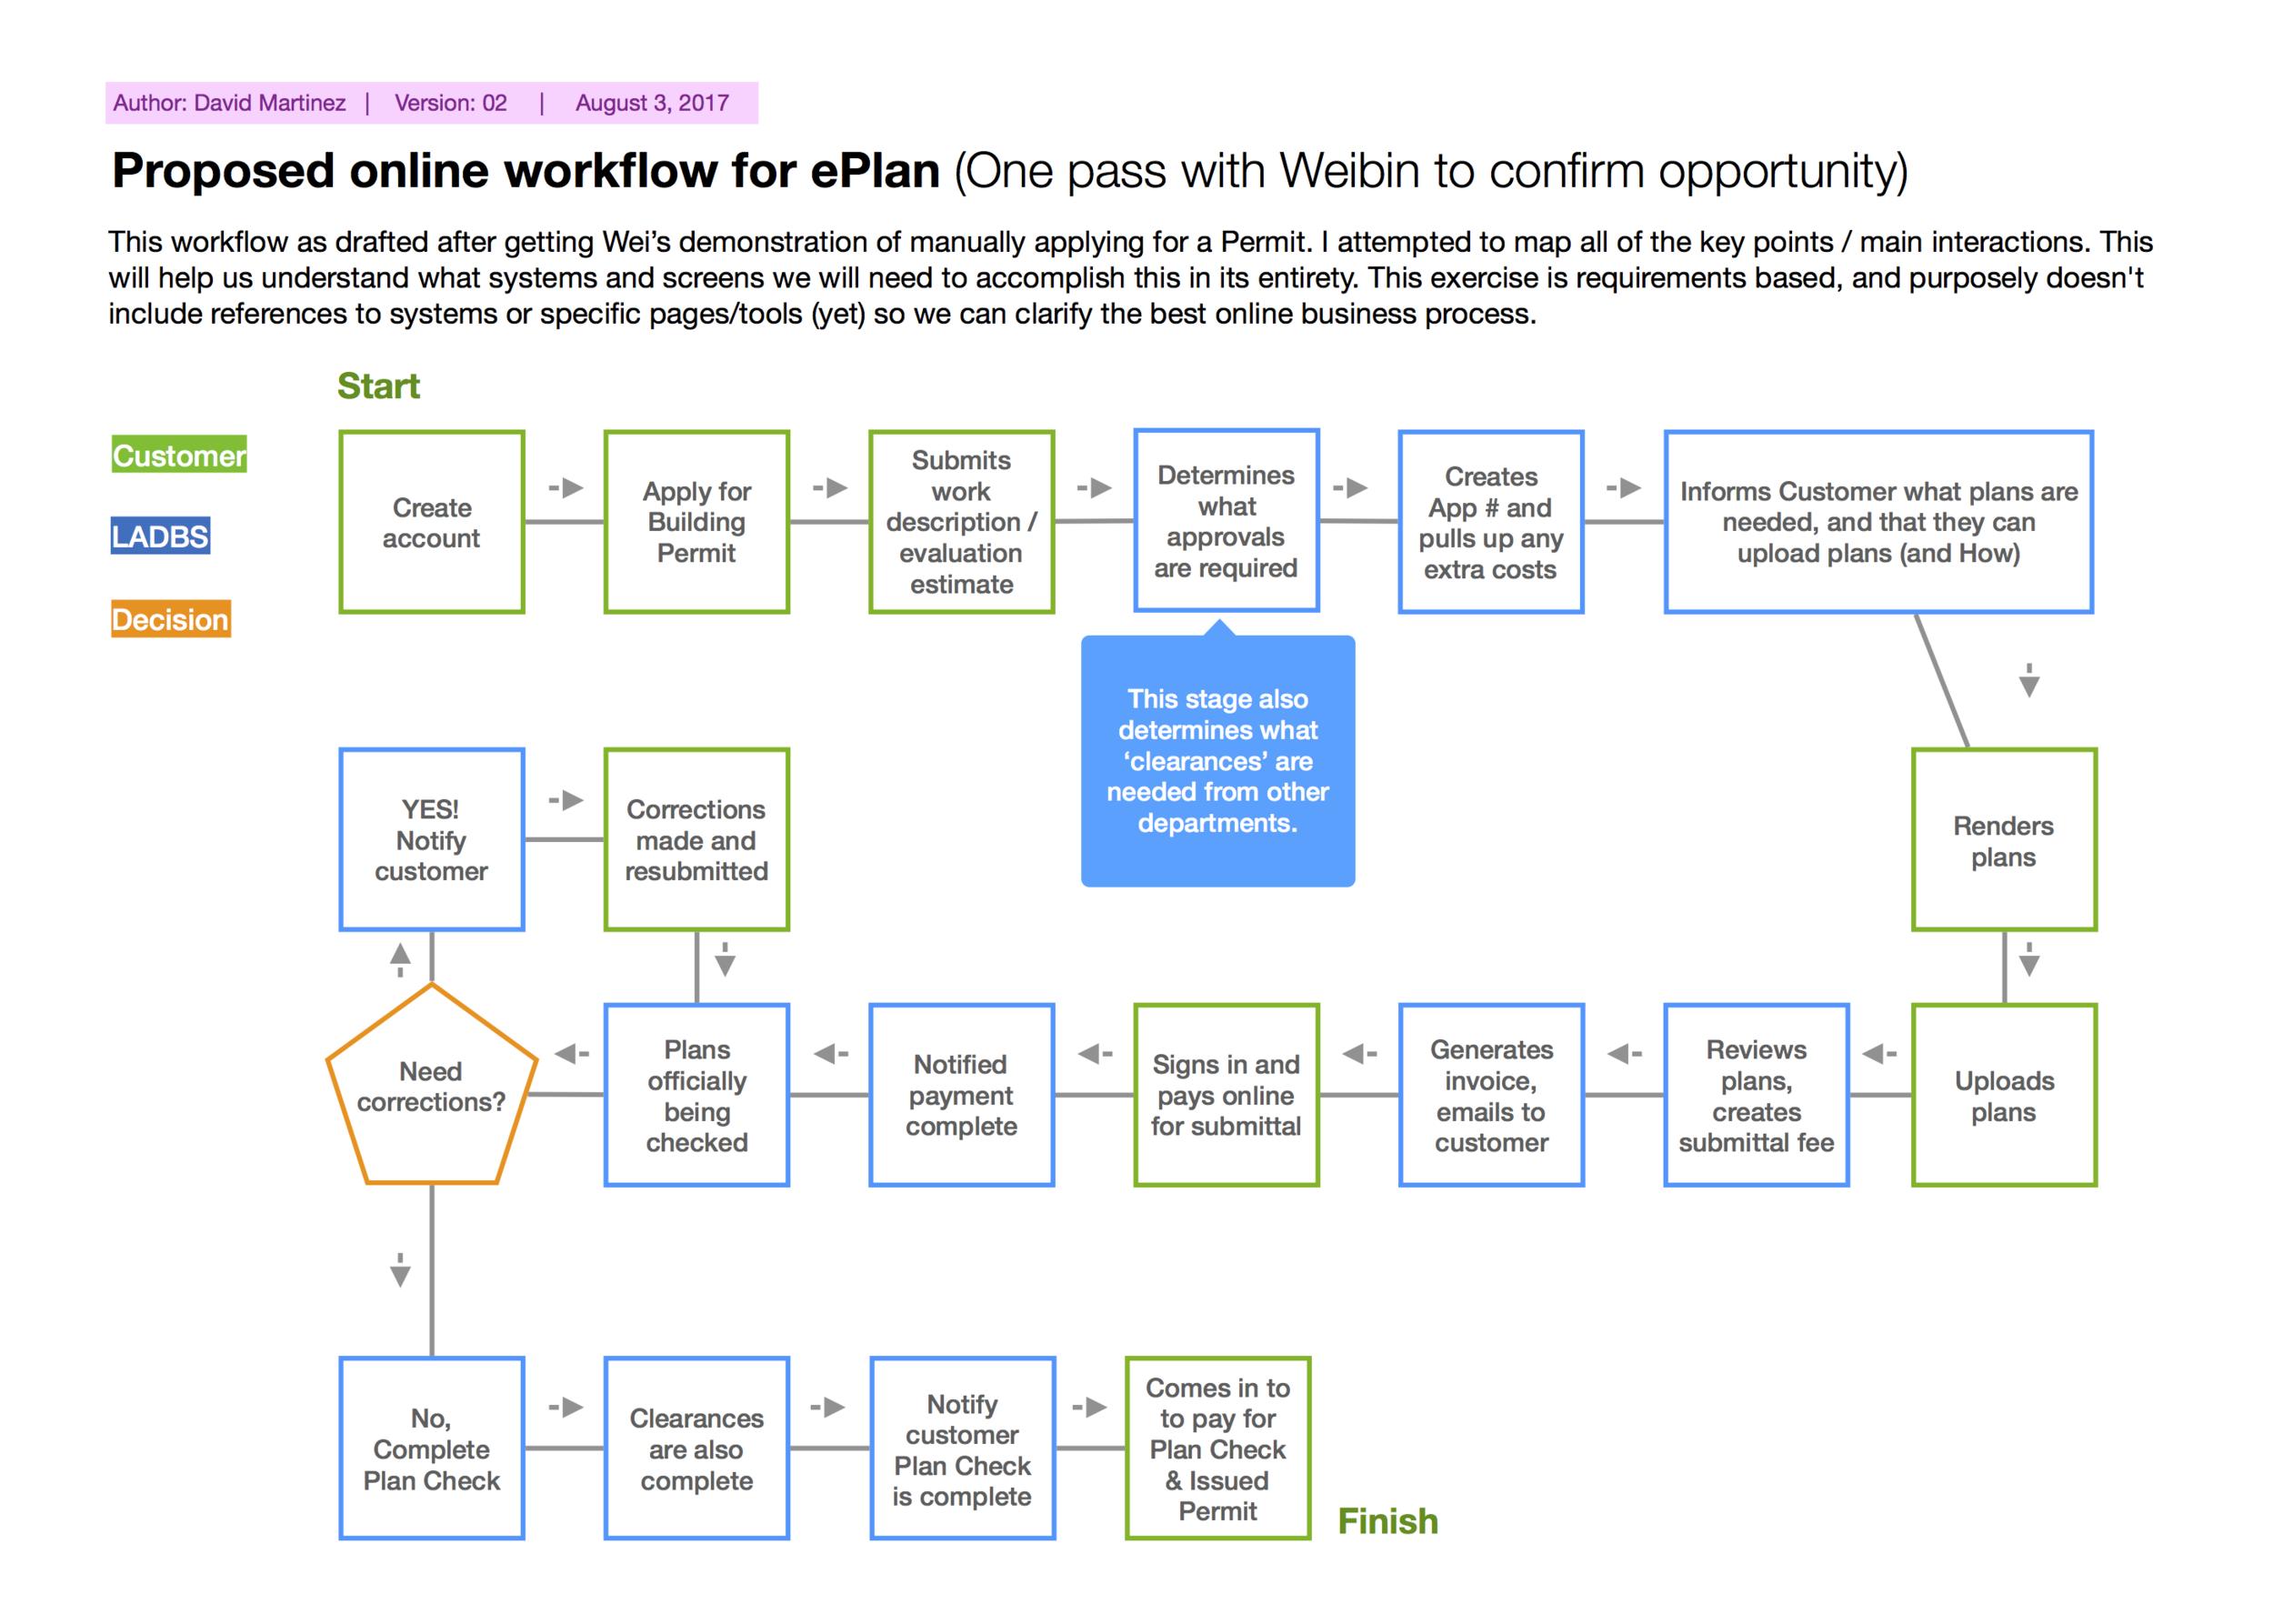 ePlan-Digital-Workflow.v2.png